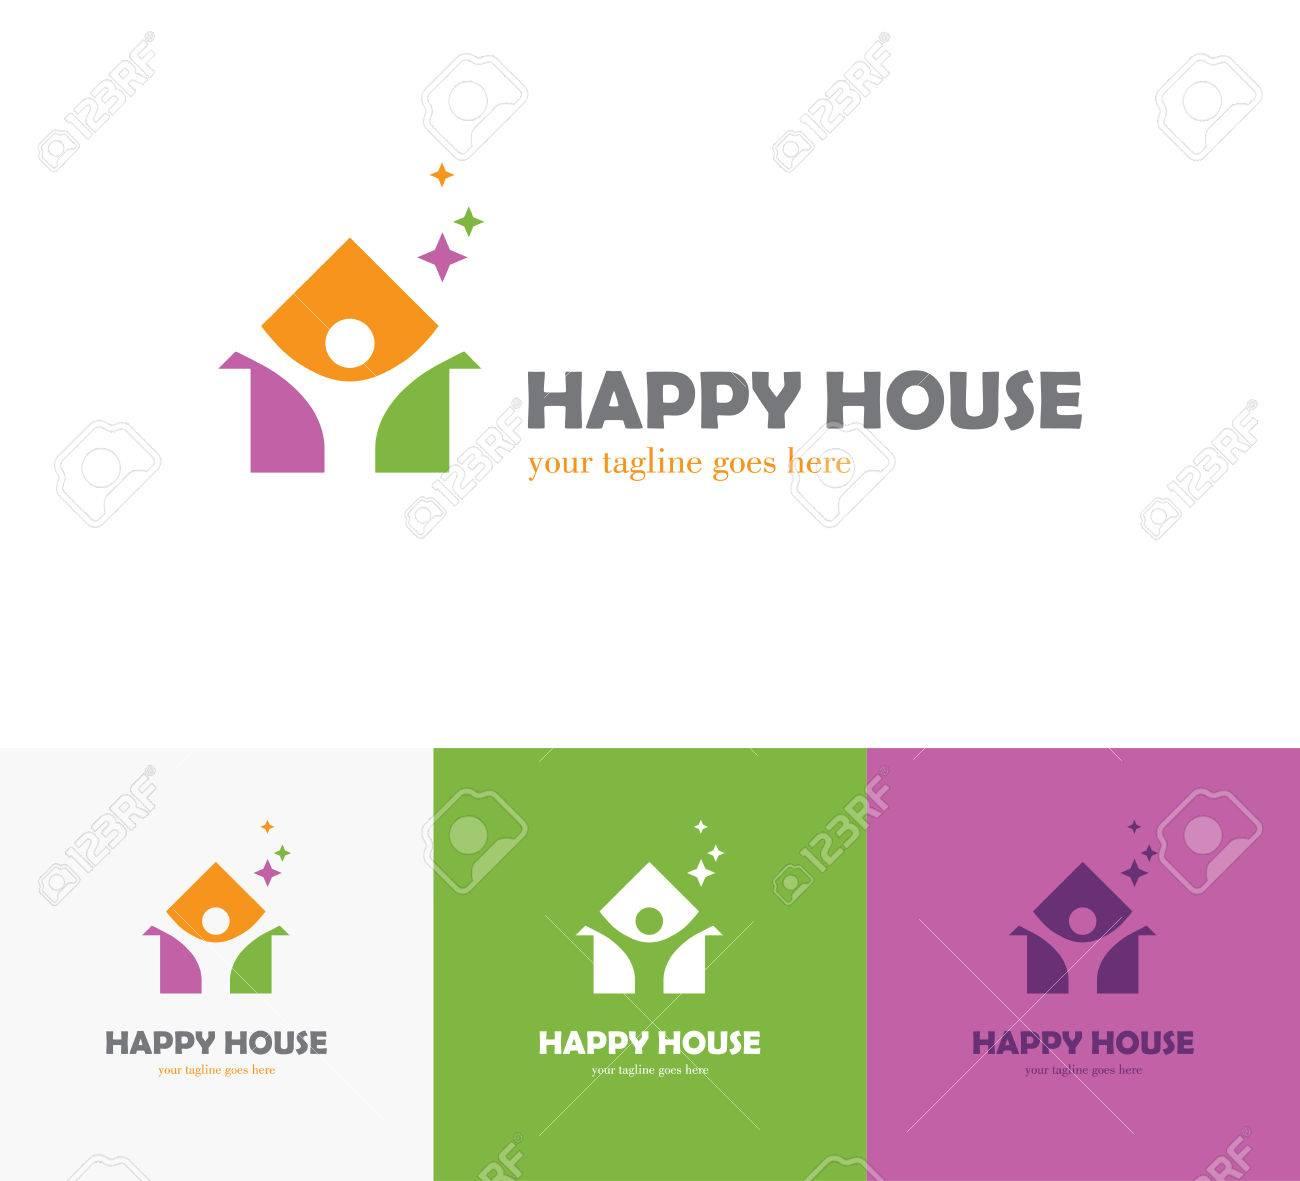 free home care logo design home care logo stock vector illustration - Home Health Logo Design